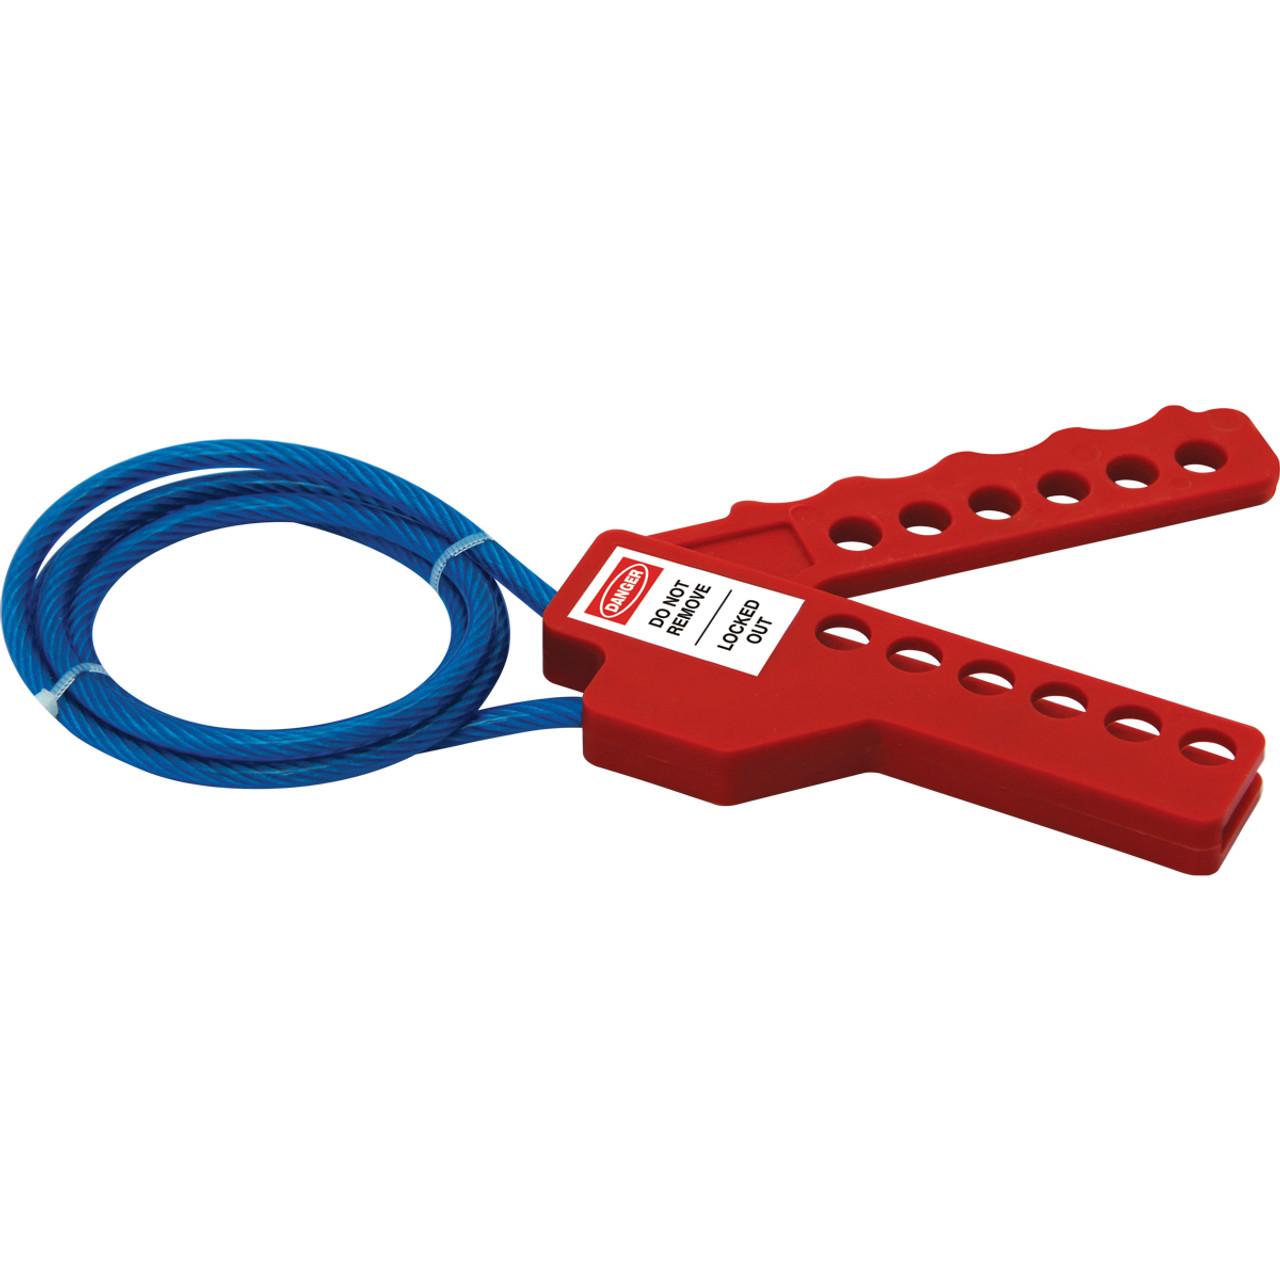 Squeezer Multipurpose Cable Lockout